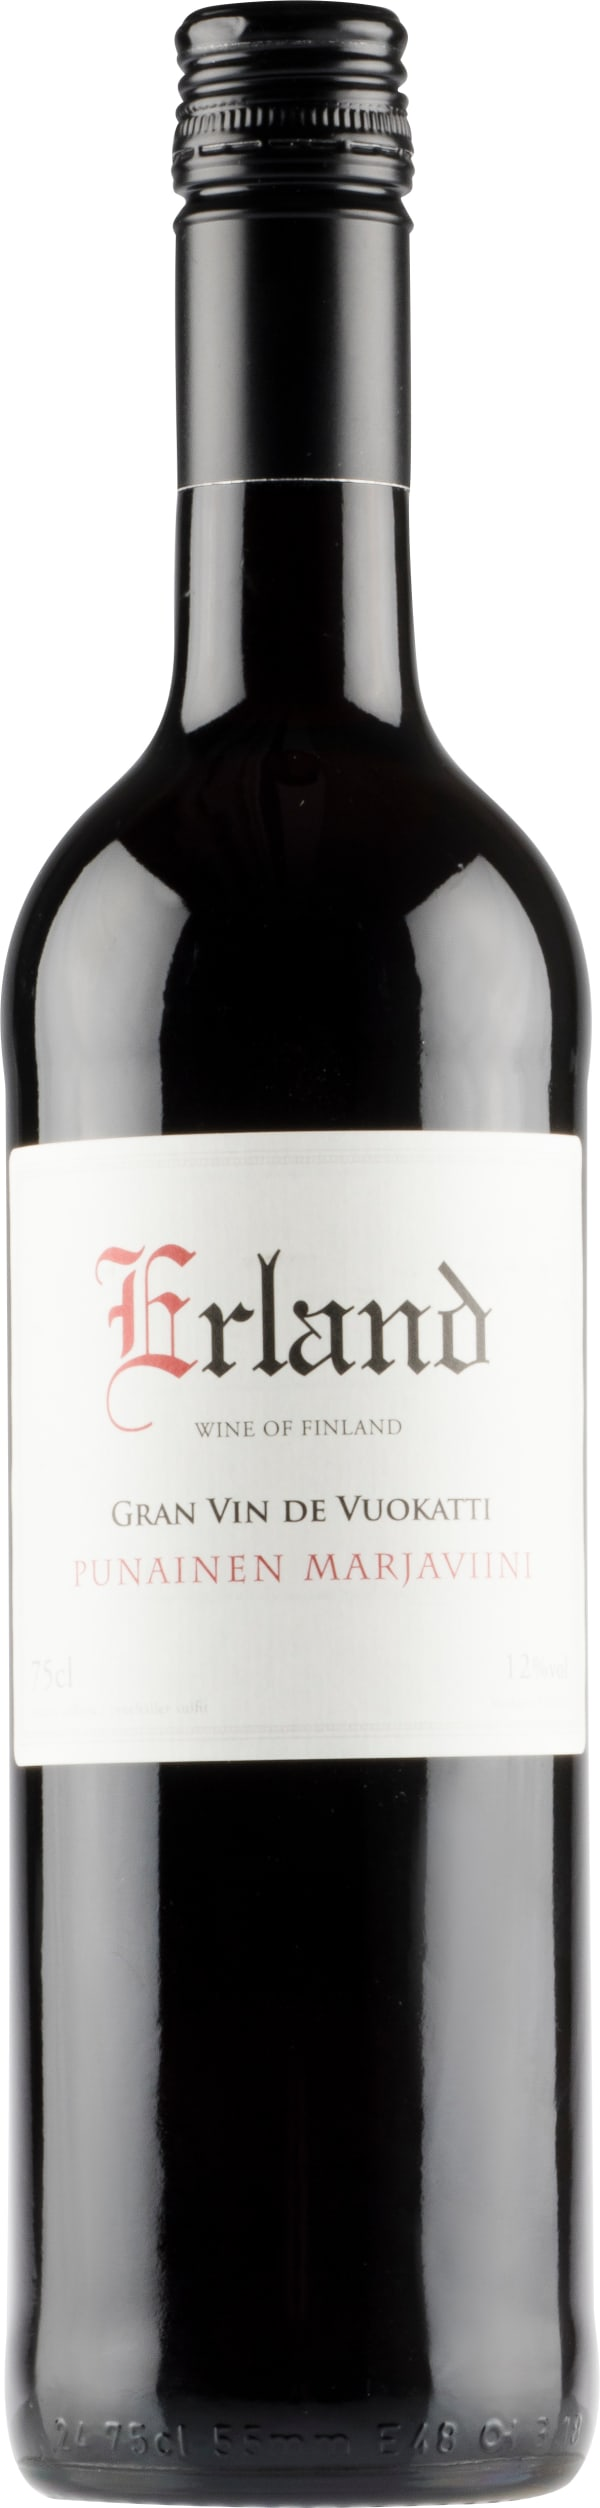 Erland Grand Vin de Vuokatti